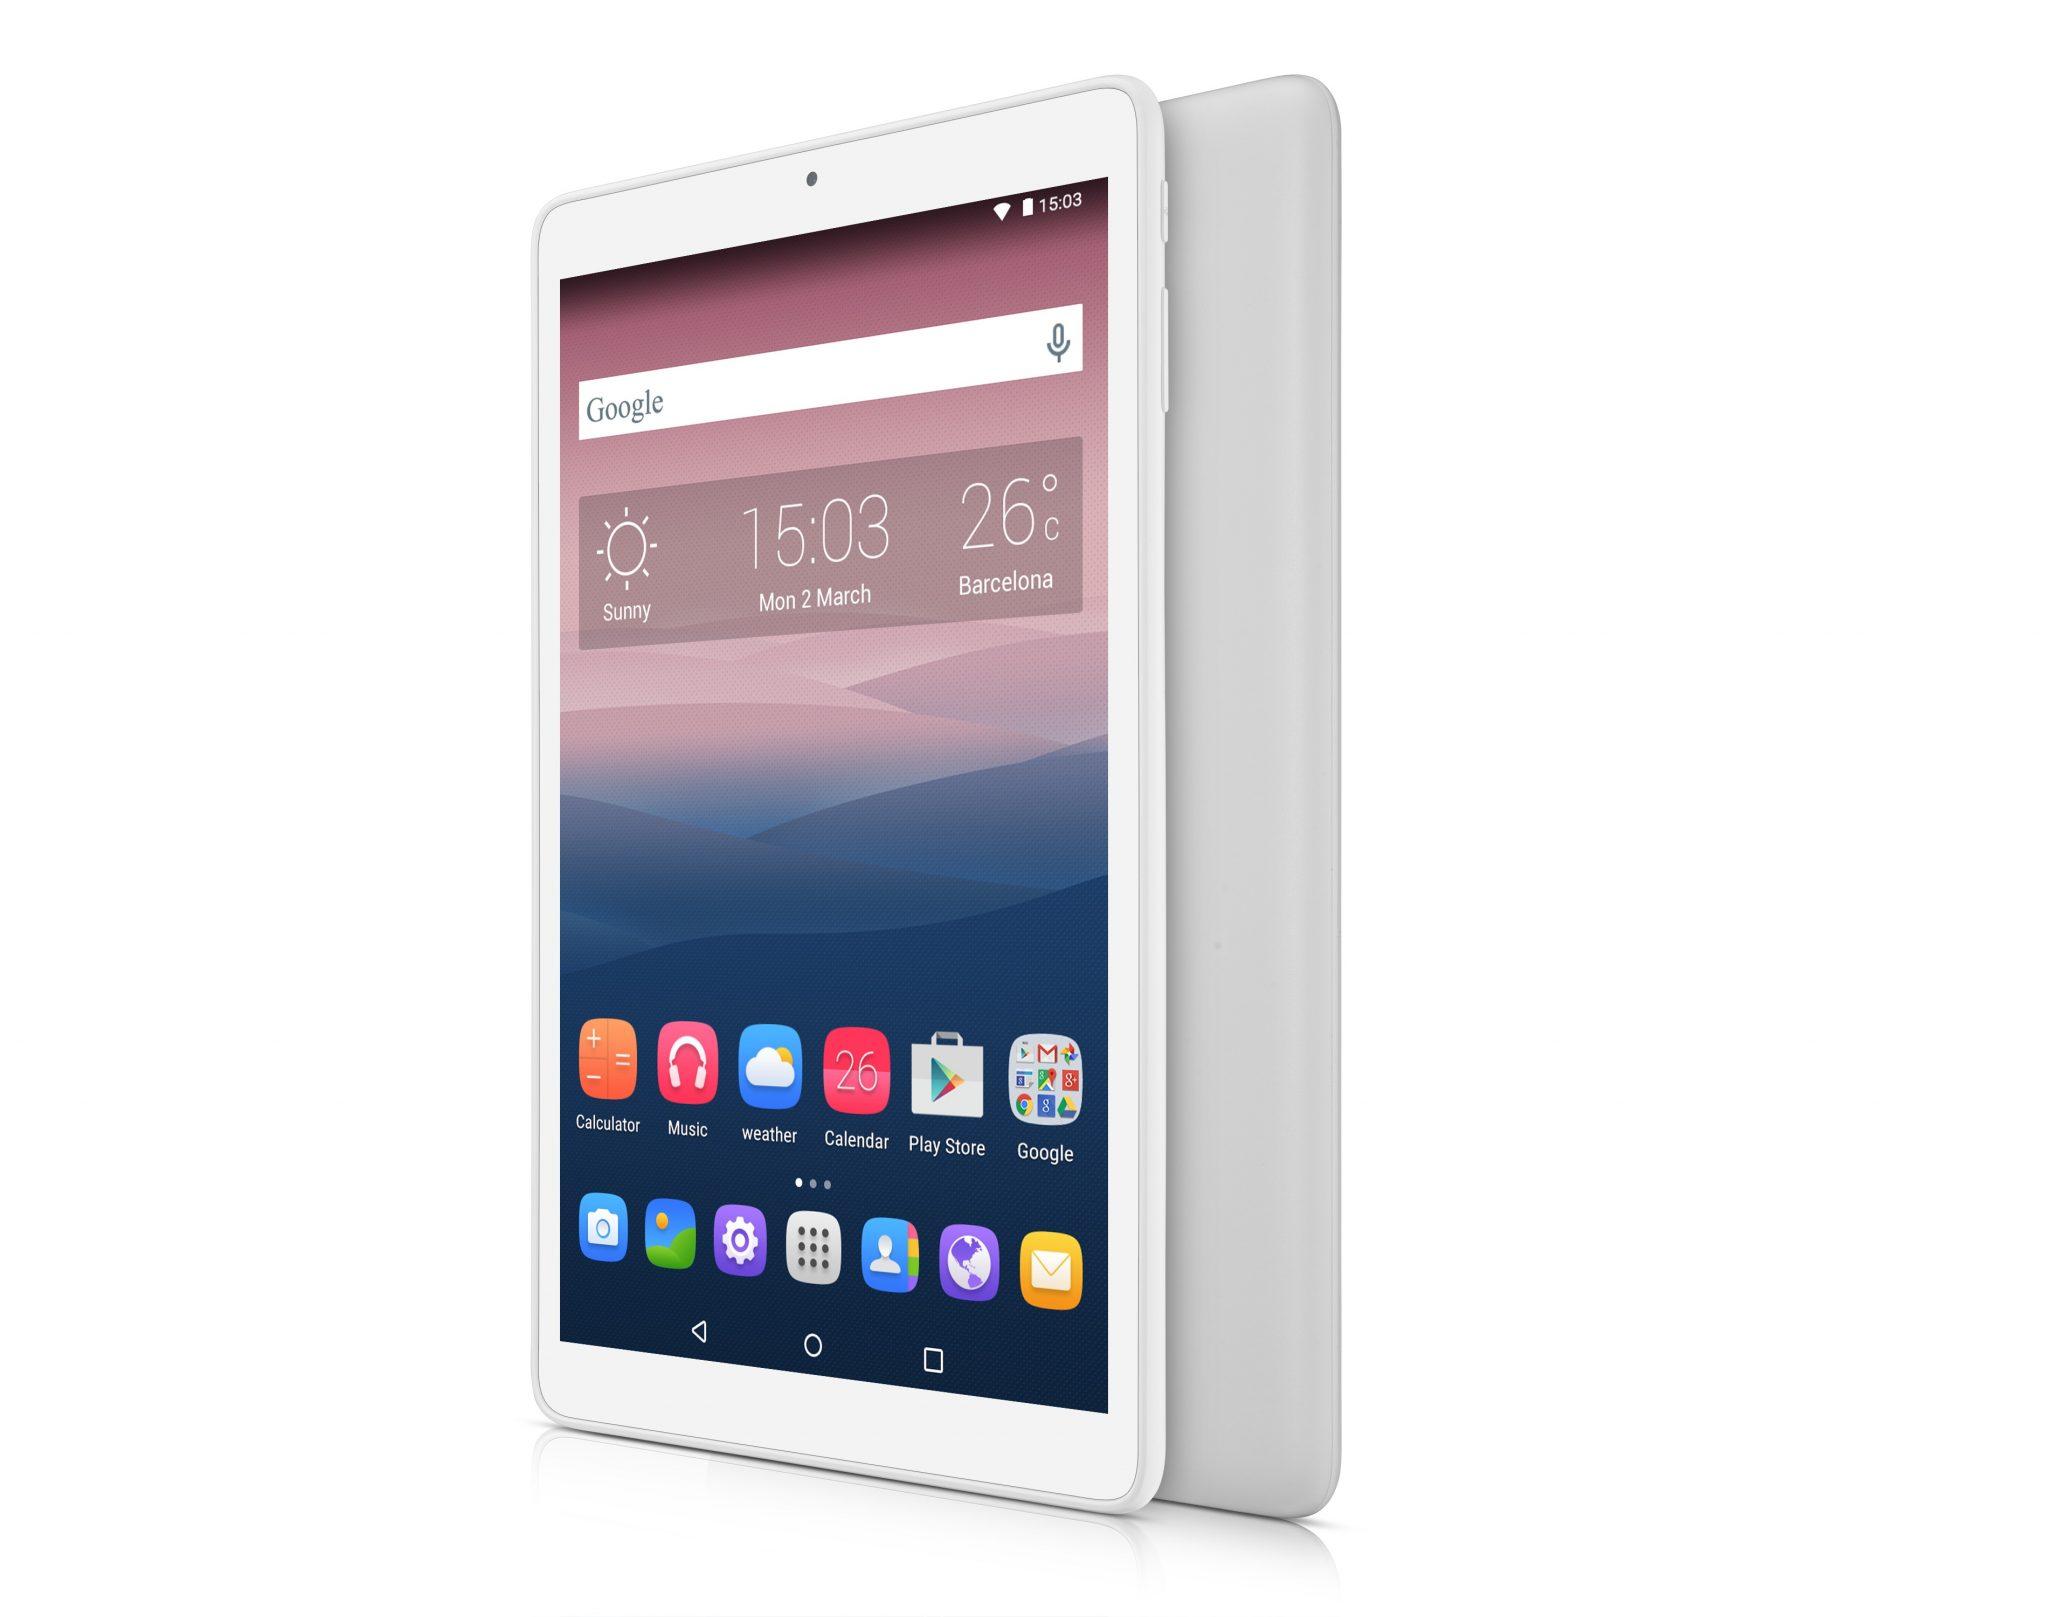 "PIXI 3 10 WHITE front and back angled right portrait1 - ALCATEL ONETOUCH presenta il tablet PIXI 3 da 10"""